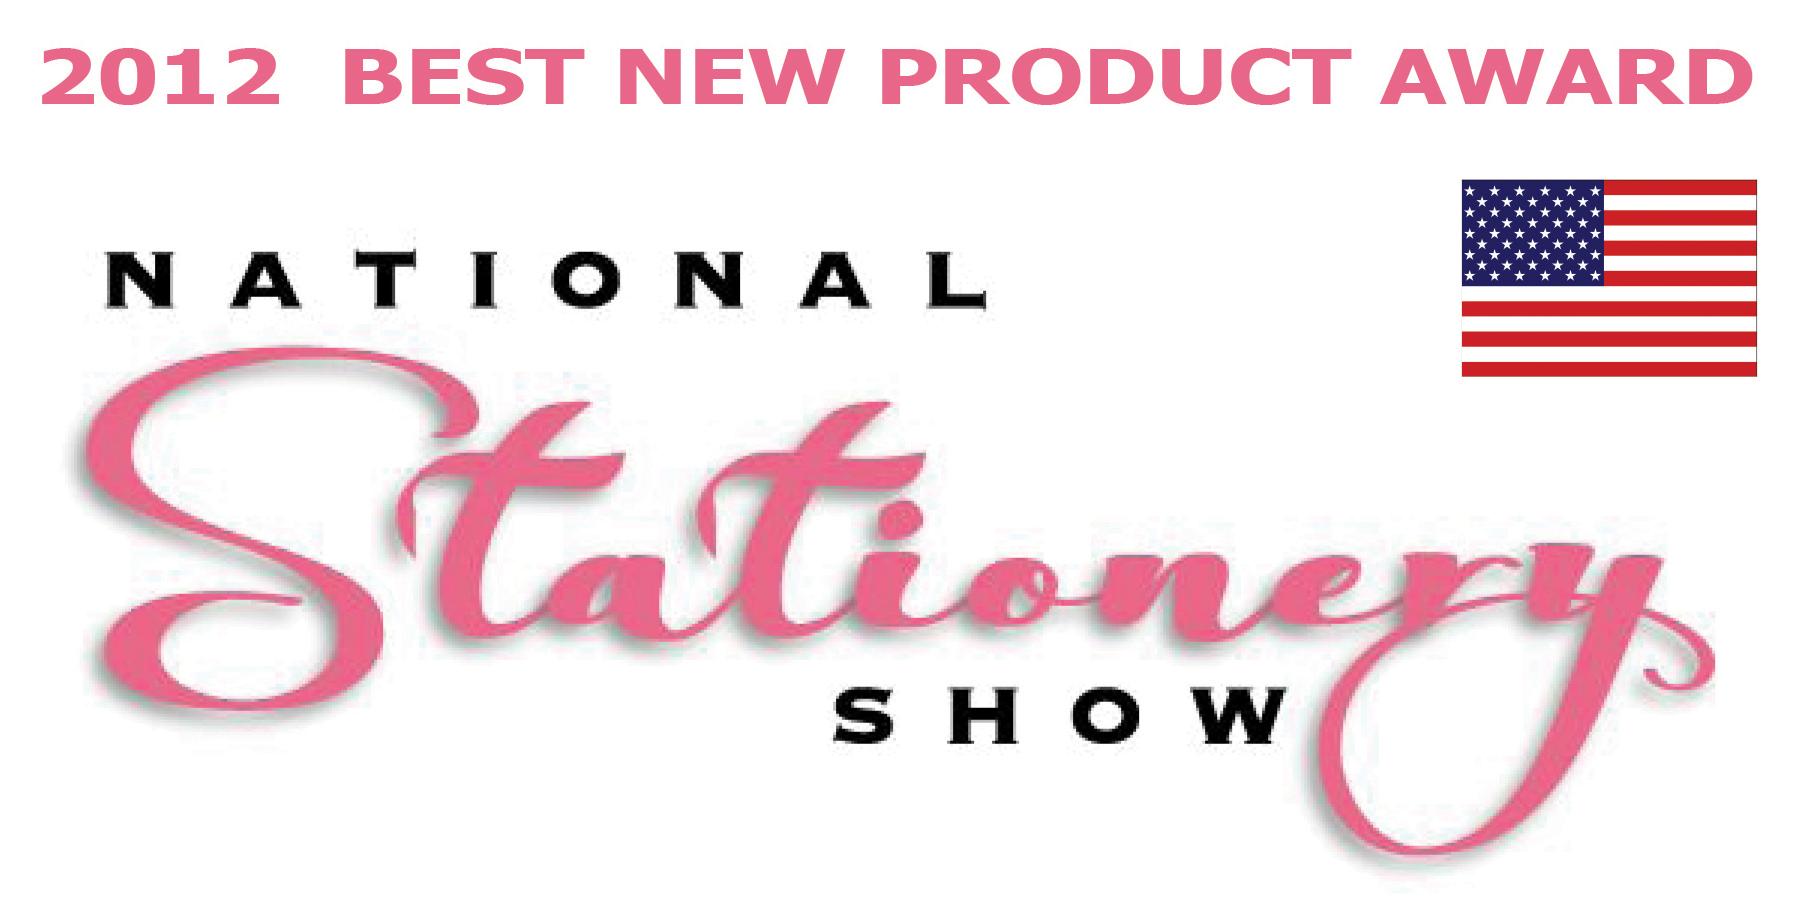 USA Best New Product Stationery Award